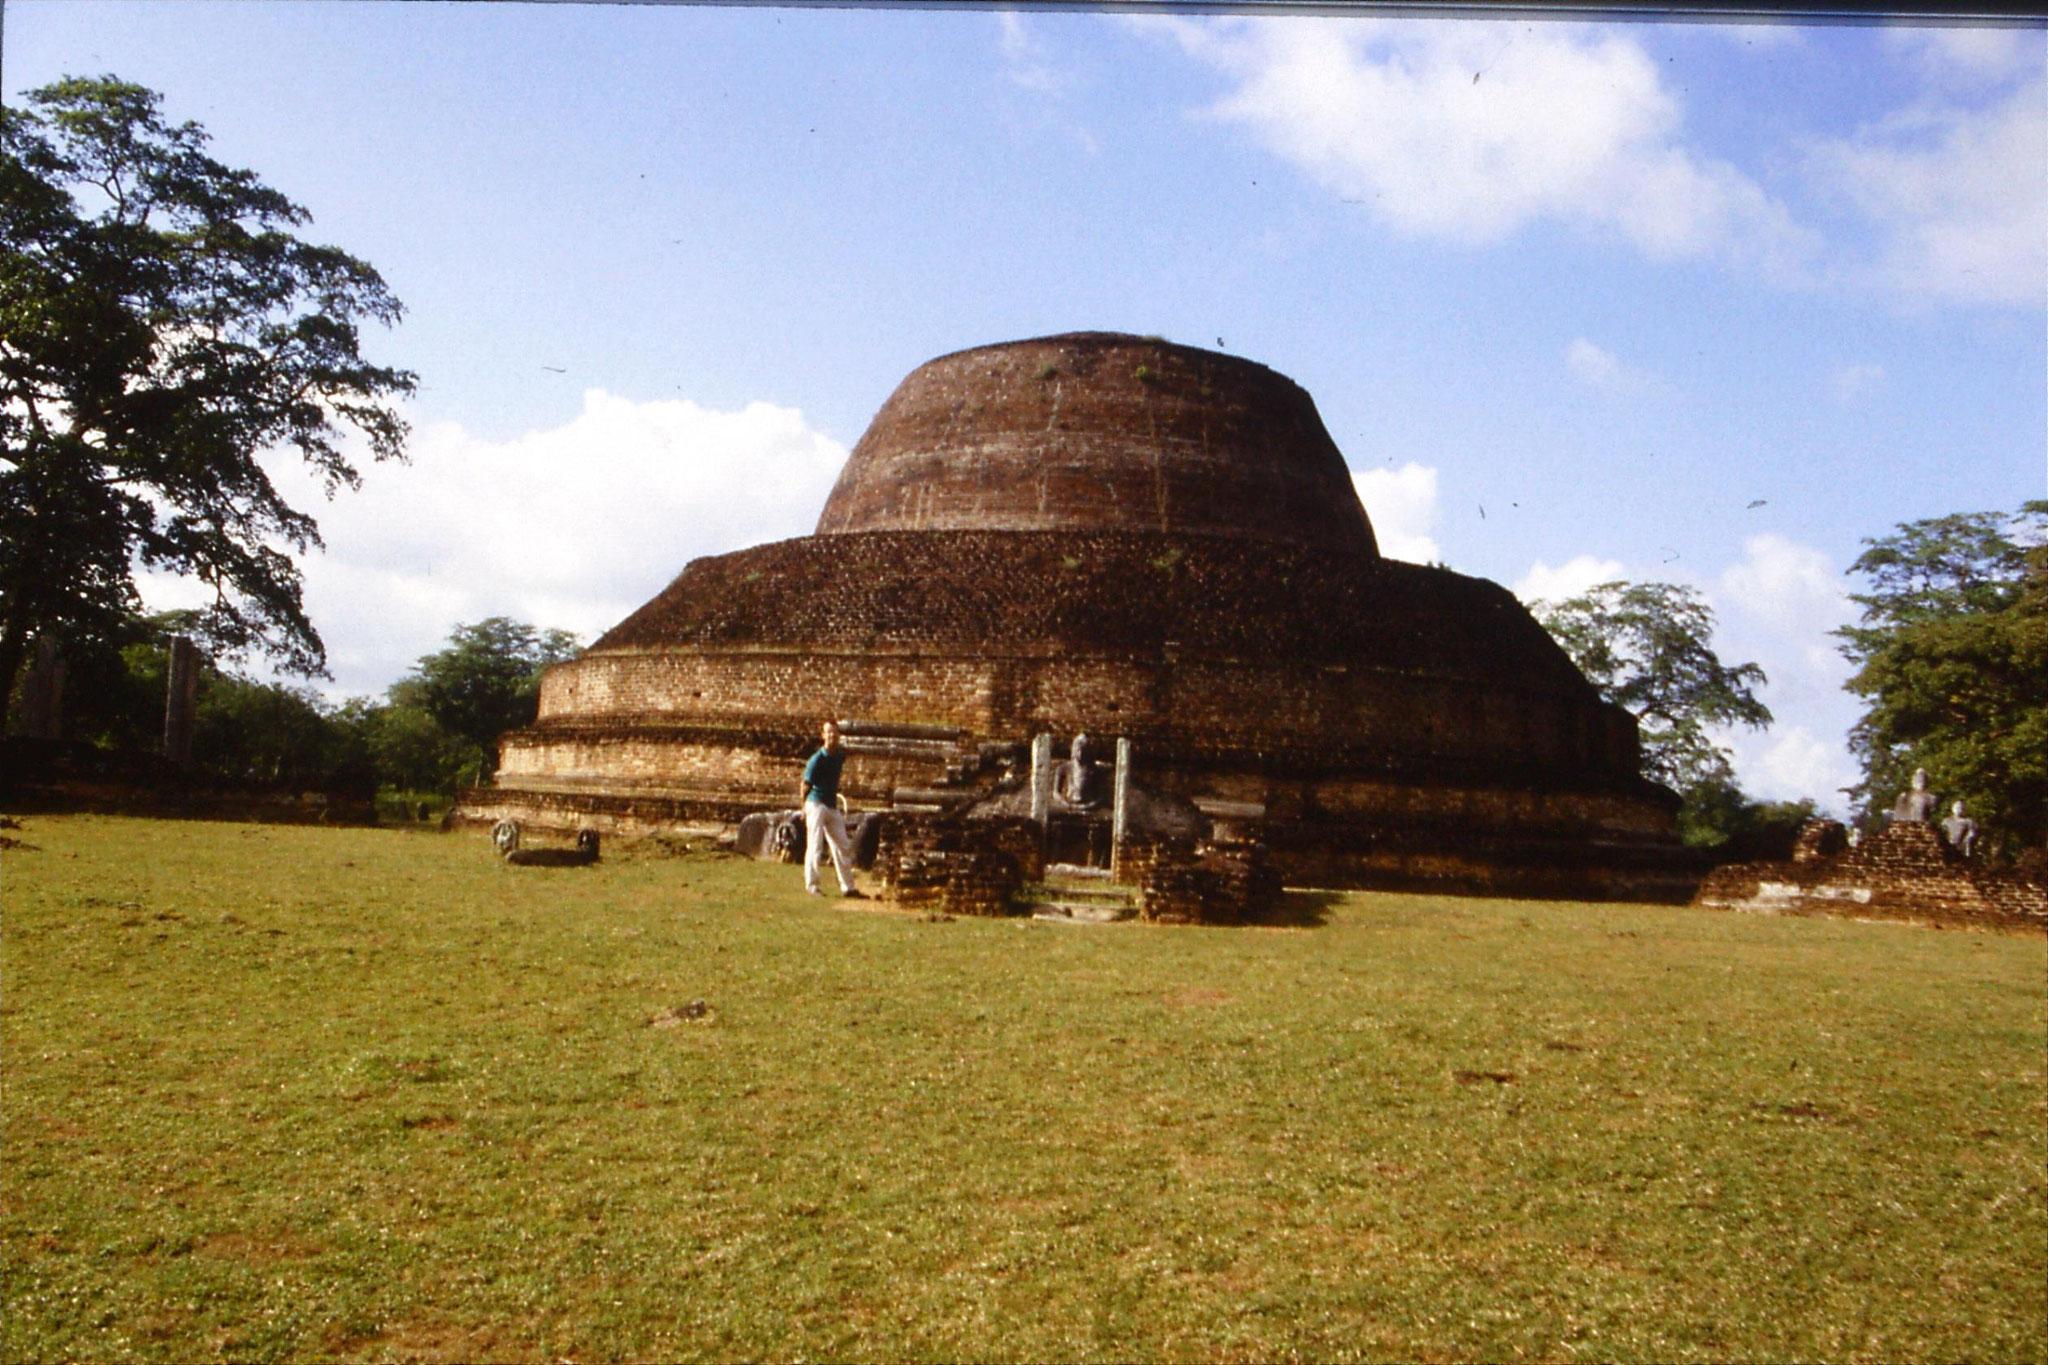 7/2/1990: 34: Polonnarua, Pabula Vihara